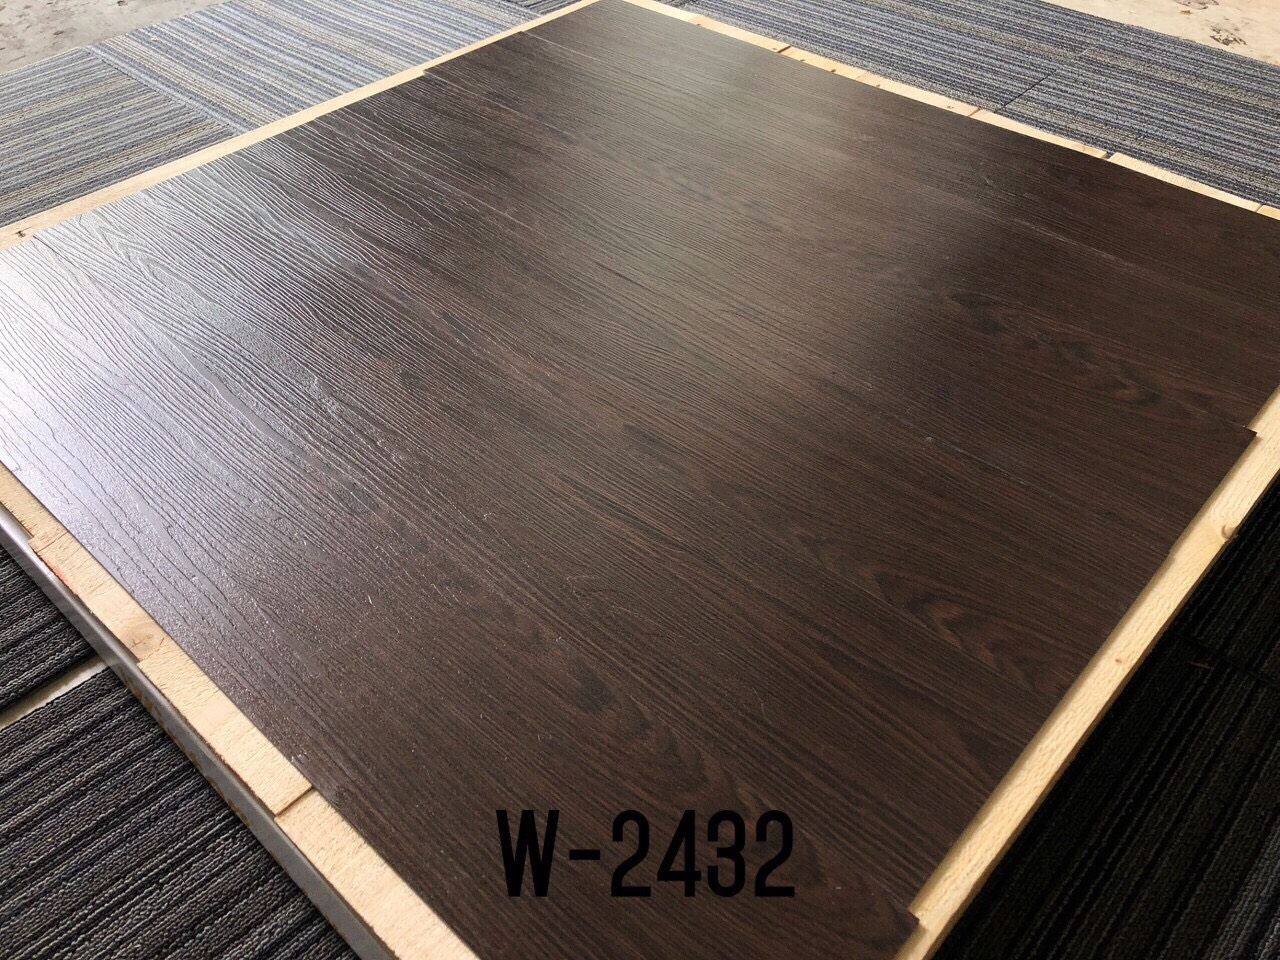 Sàn nhựa vân gỗ Nanolife 3mm W2432